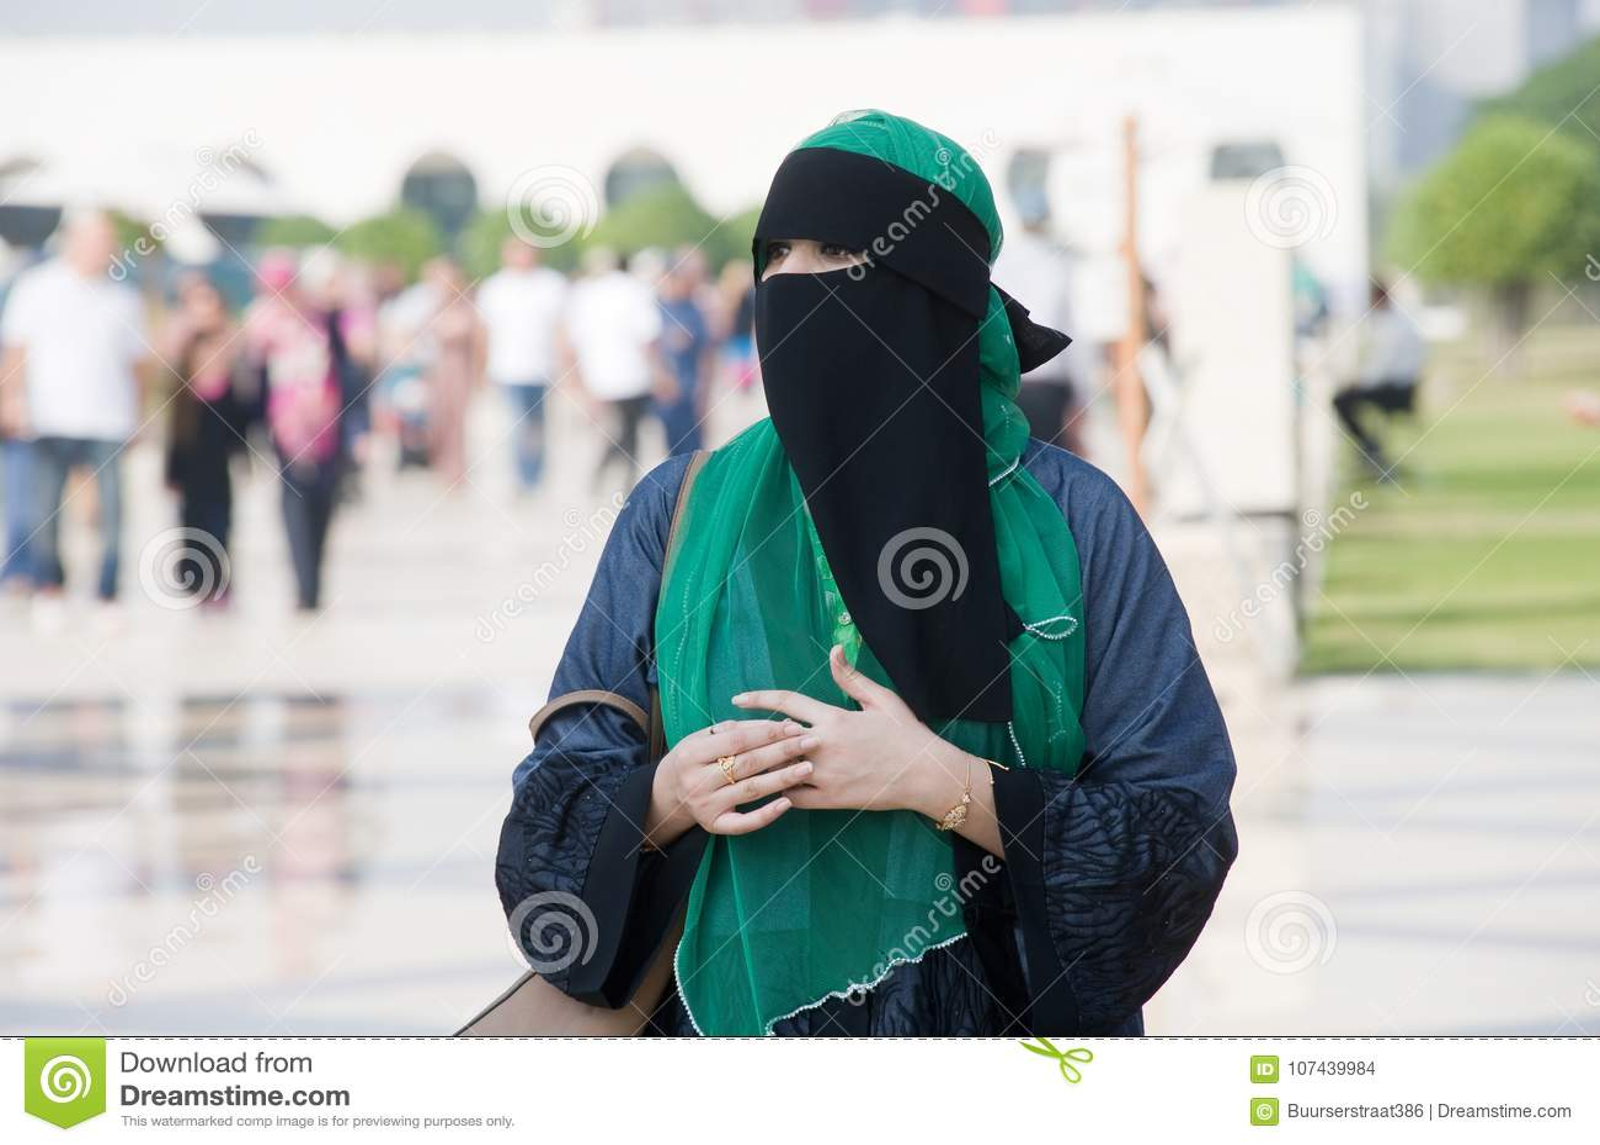 muslima com arabic